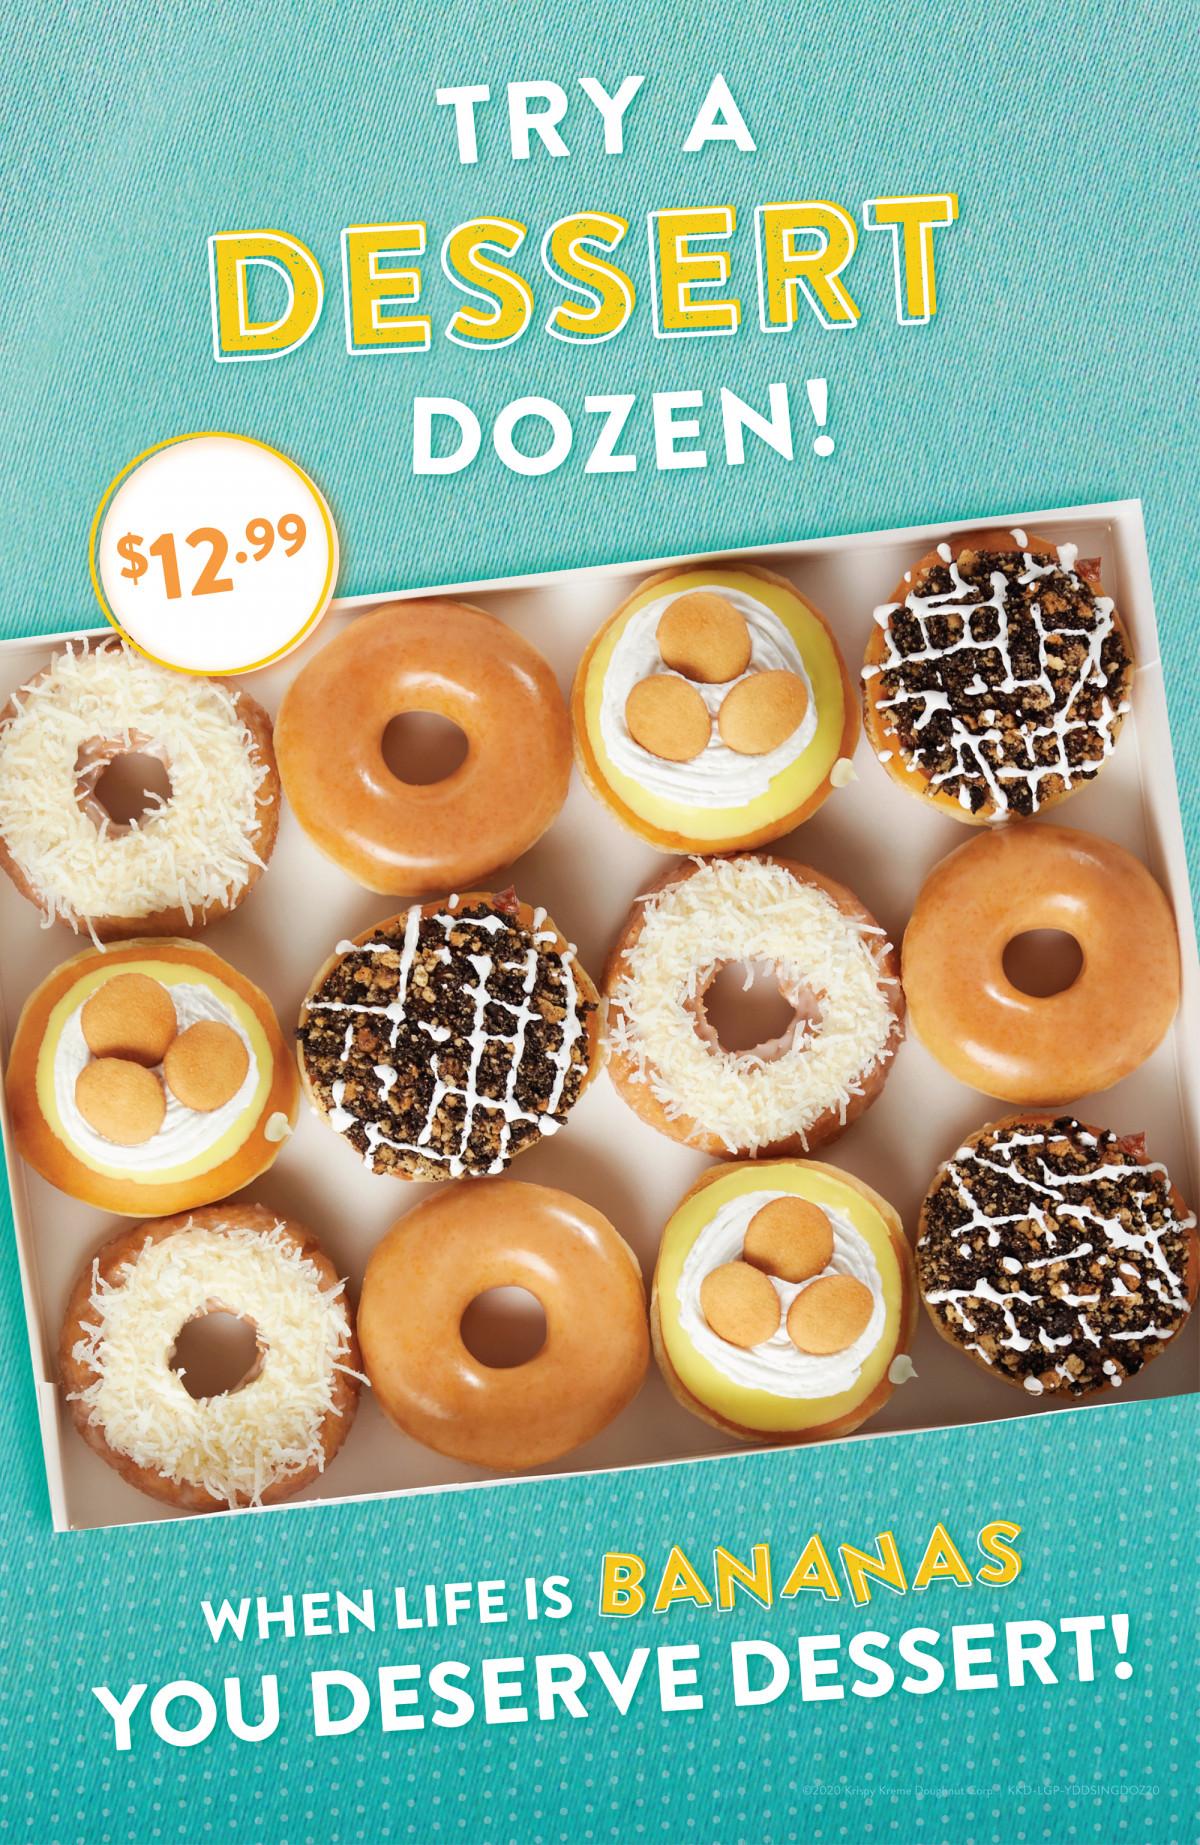 Krispy Kreme Doughnuts Dessert Dozen Tear Sheet by Salt Paper Studio of Charlotte, NC